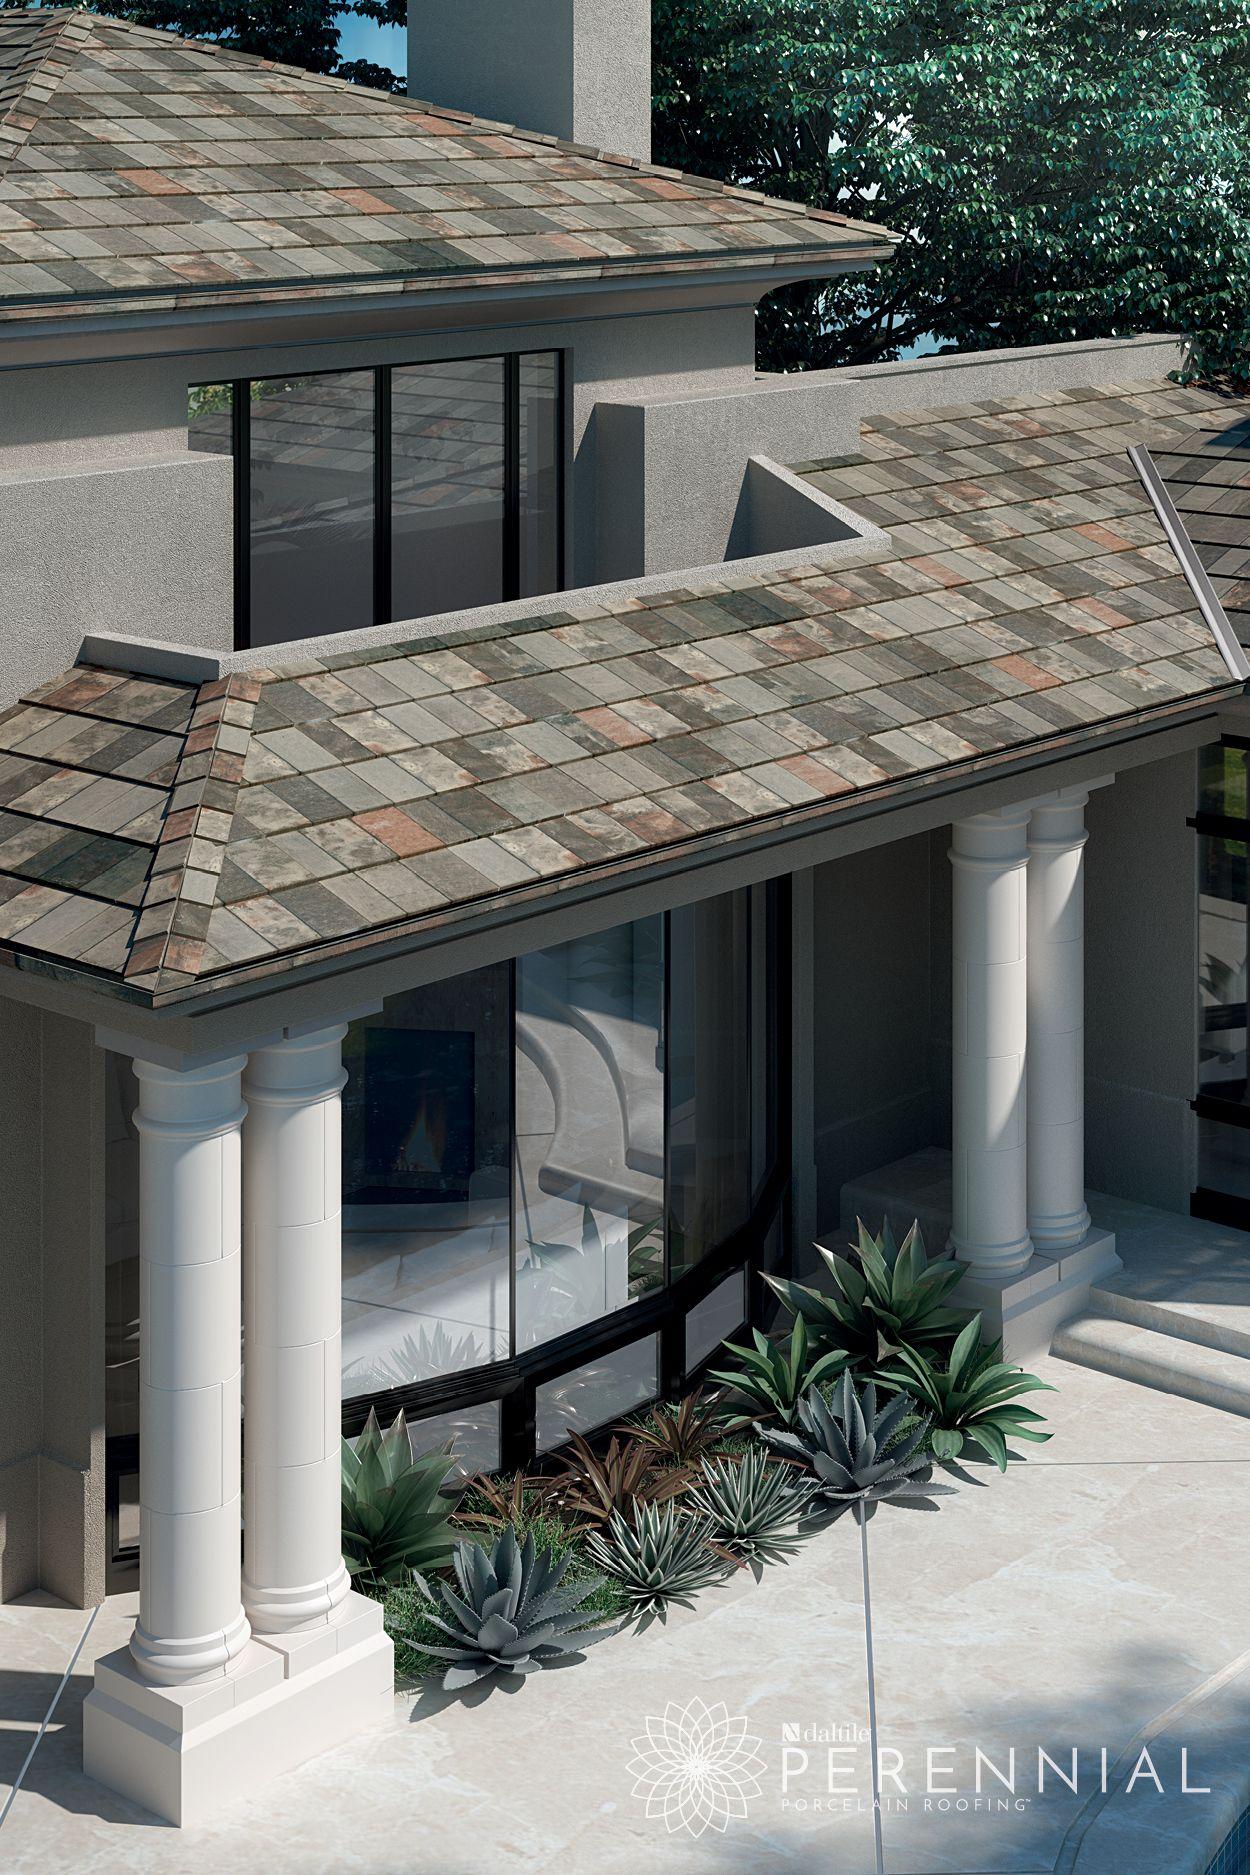 11 roof tile ideas ceramic roof tiles